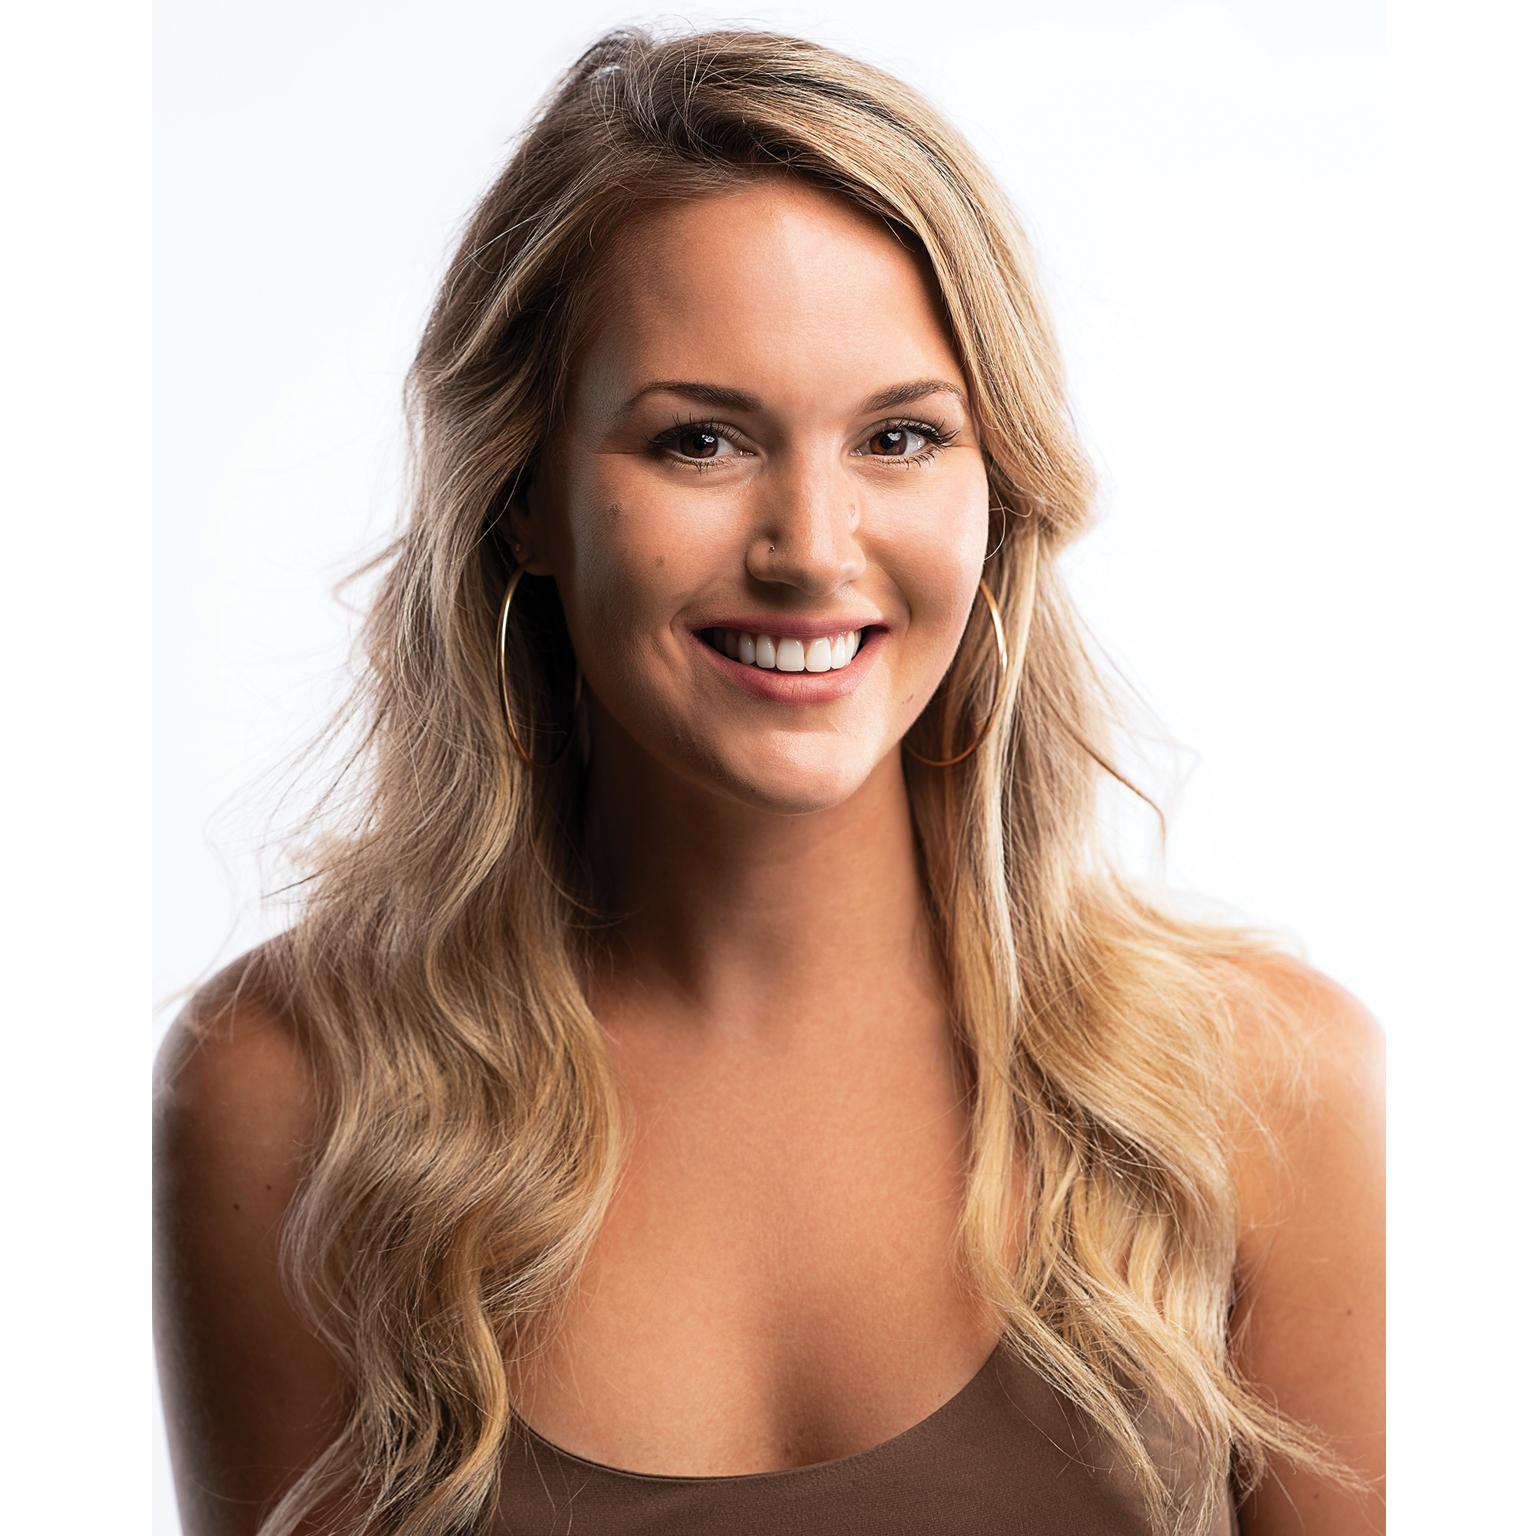 Toronto-Fitness-Model-Agency-Headshot-Lifestyle-Christine-McCabe